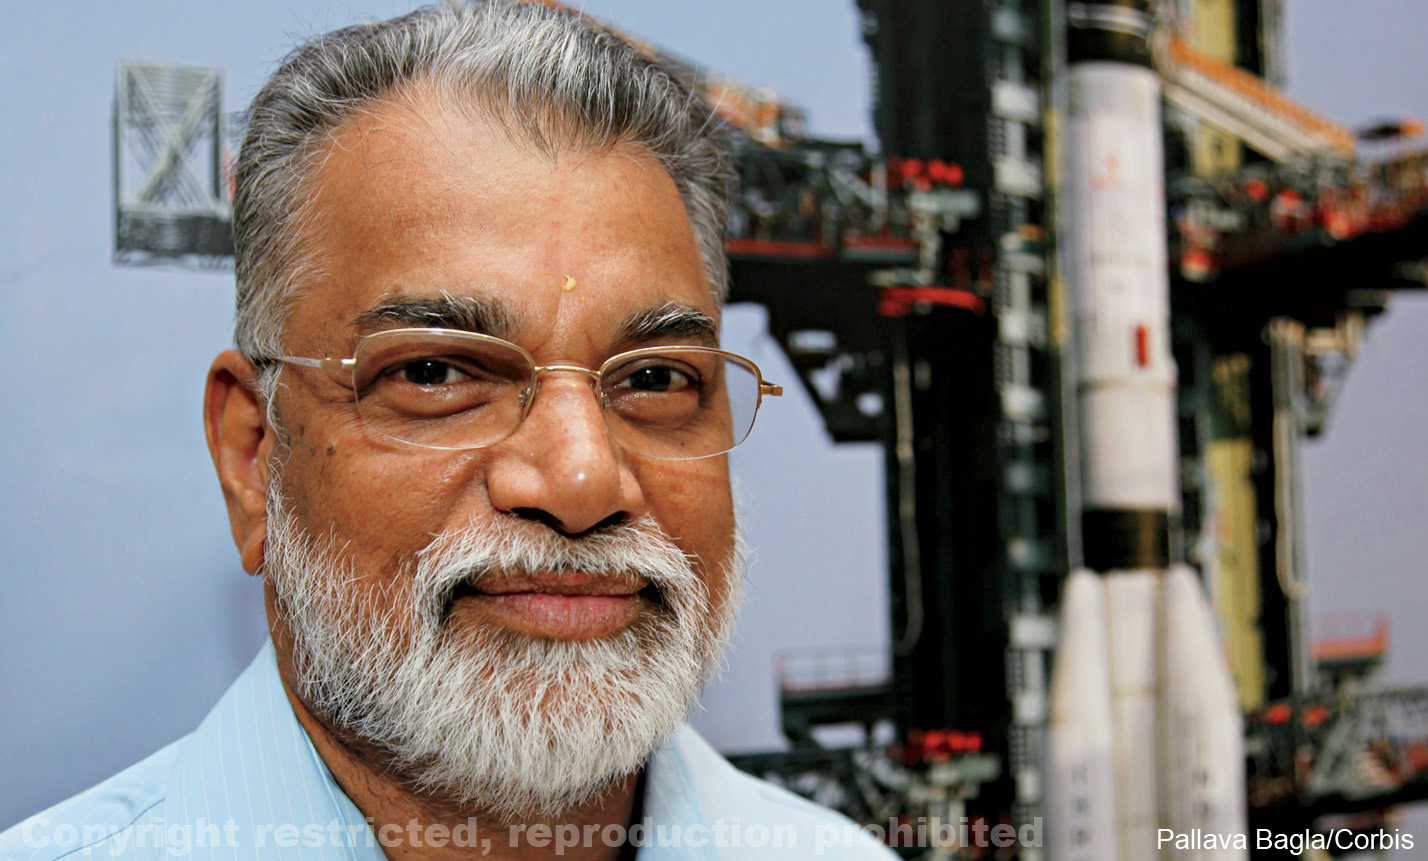 K. Radhakrishnan, Chairman of the Indian Space Research Organization